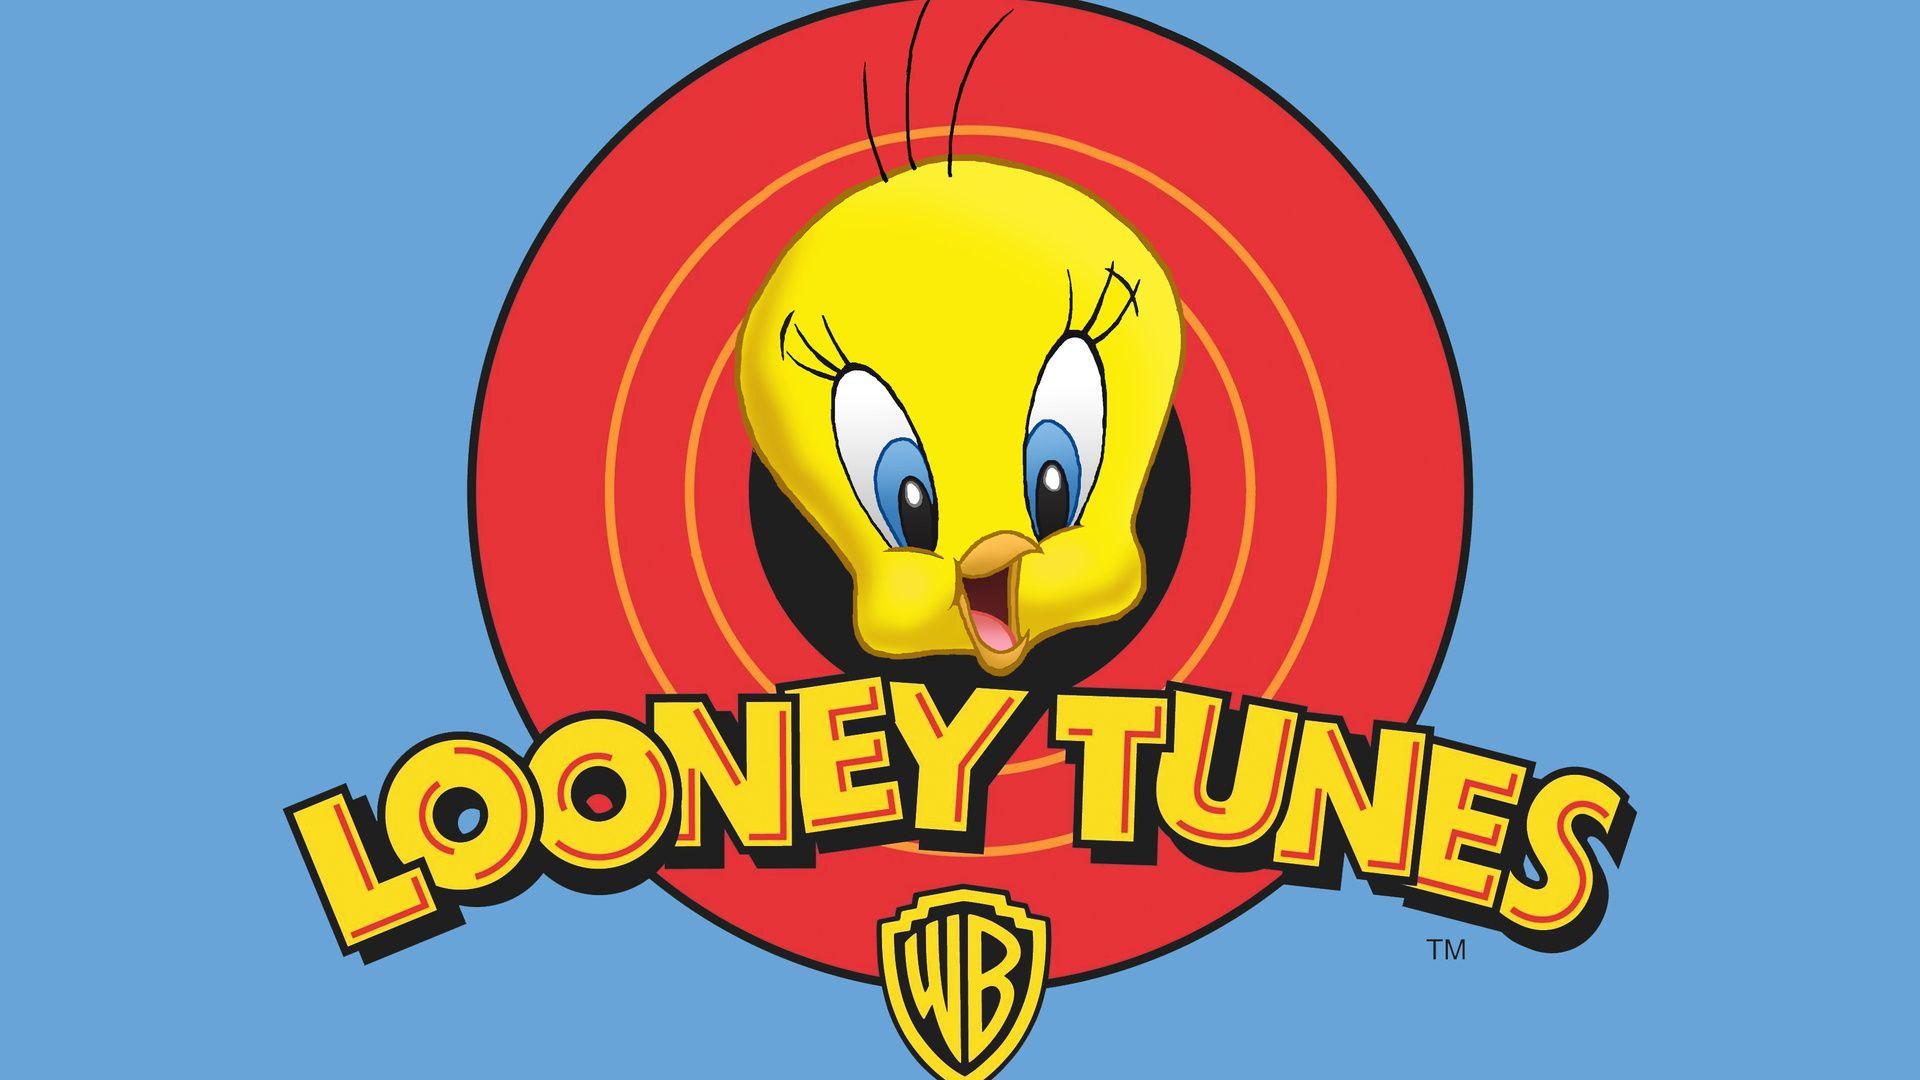 Looney Tunes PC Wallpaper